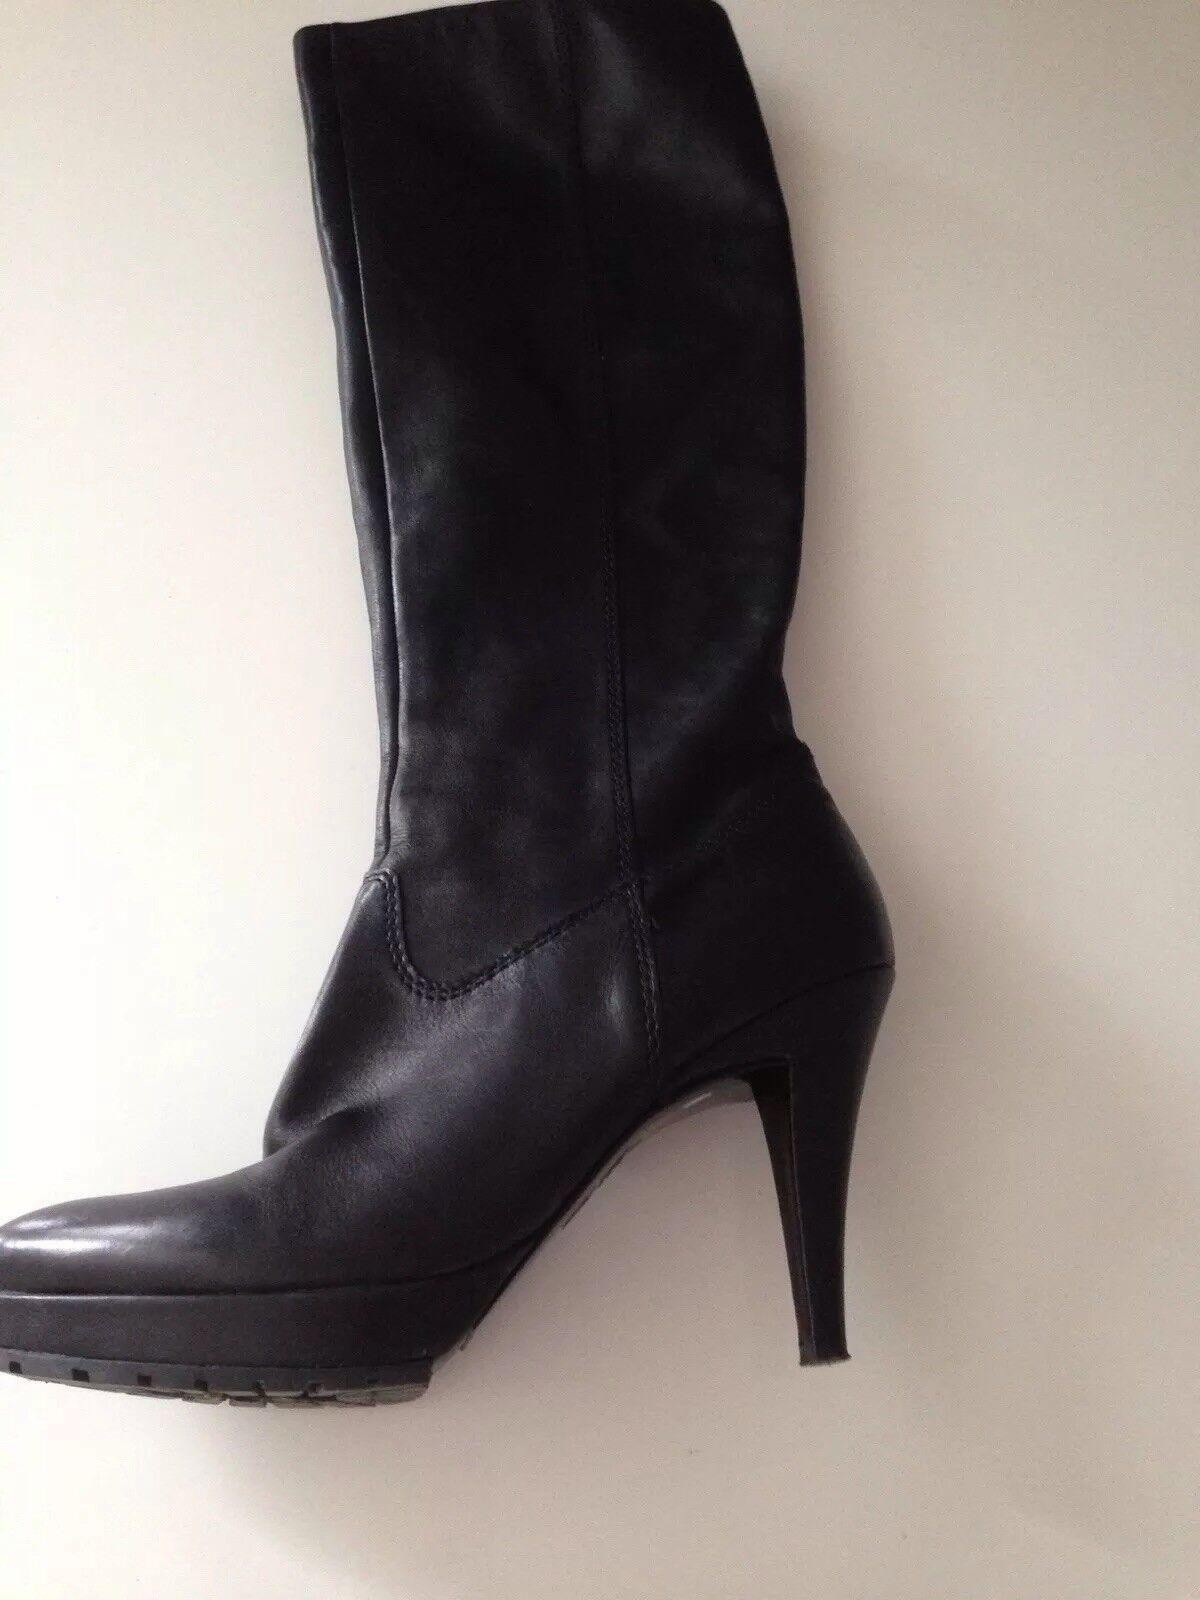 Kennel & Schmenger High Heel Stiefel Gr.39 Made in Germany